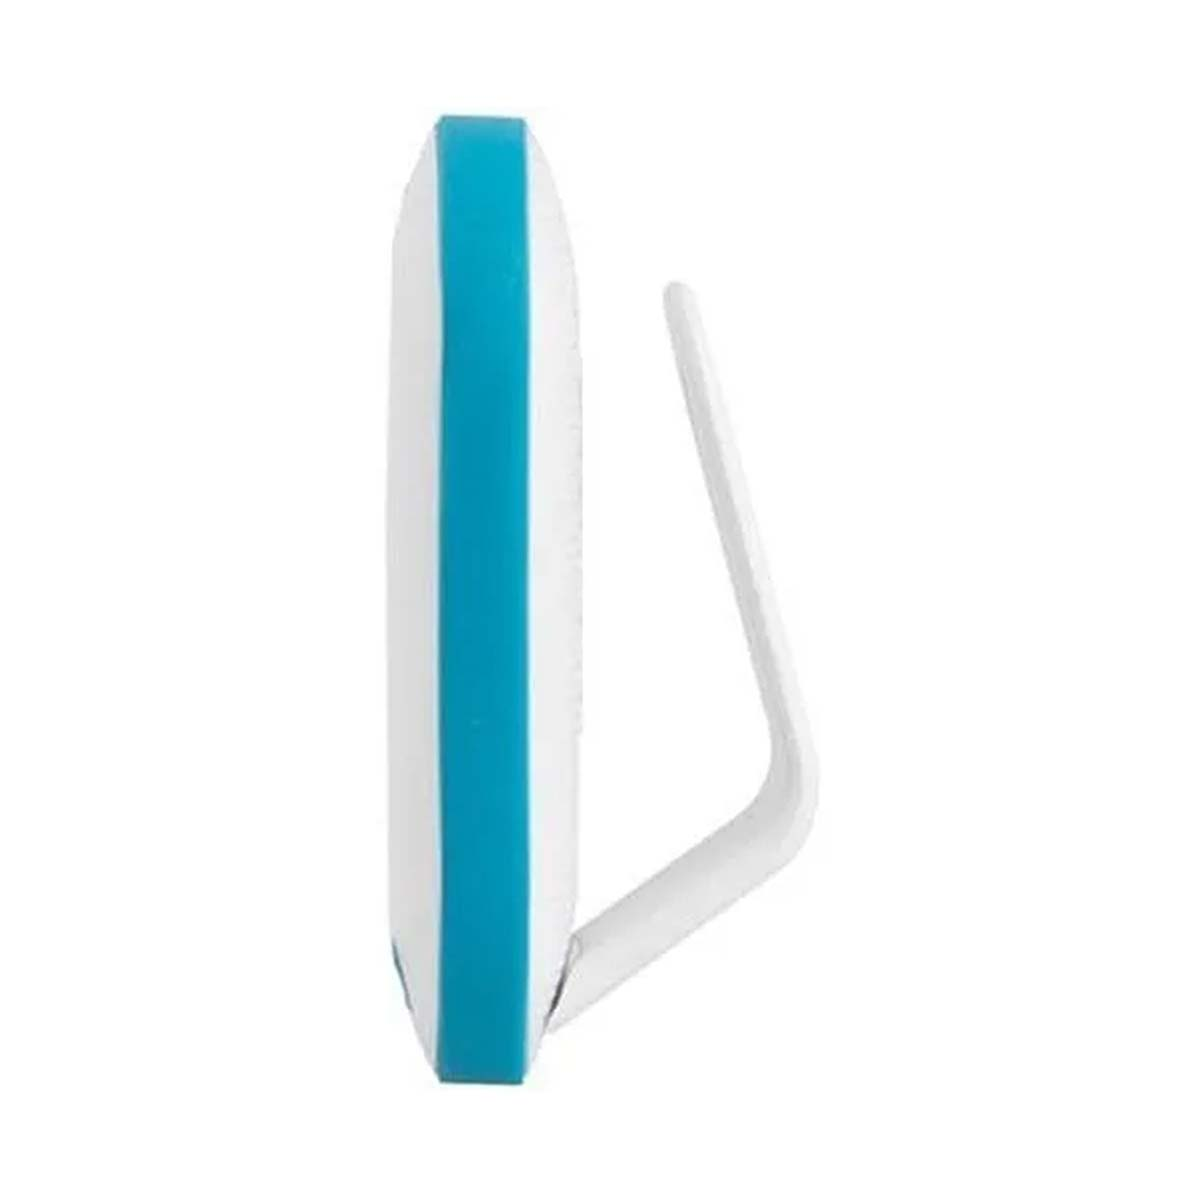 Kit 07 Controle Remoto Intelbras 433mhz Xac 4000 Smart Azul